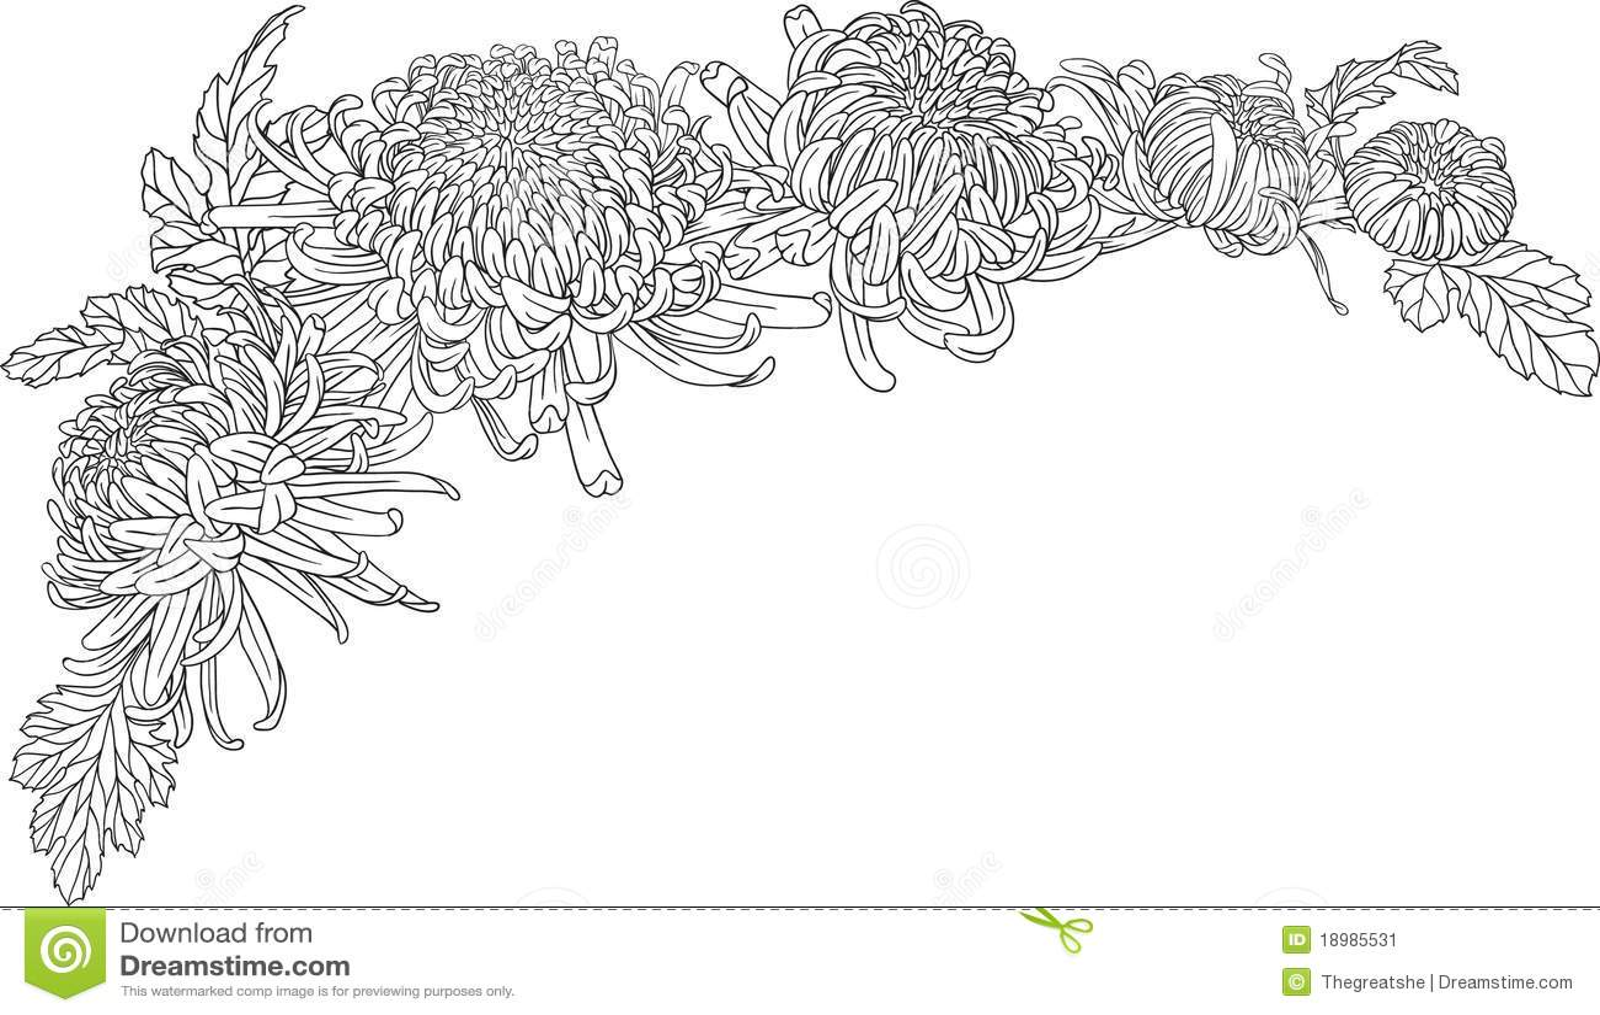 Chrysanthemum tattoo sleeve